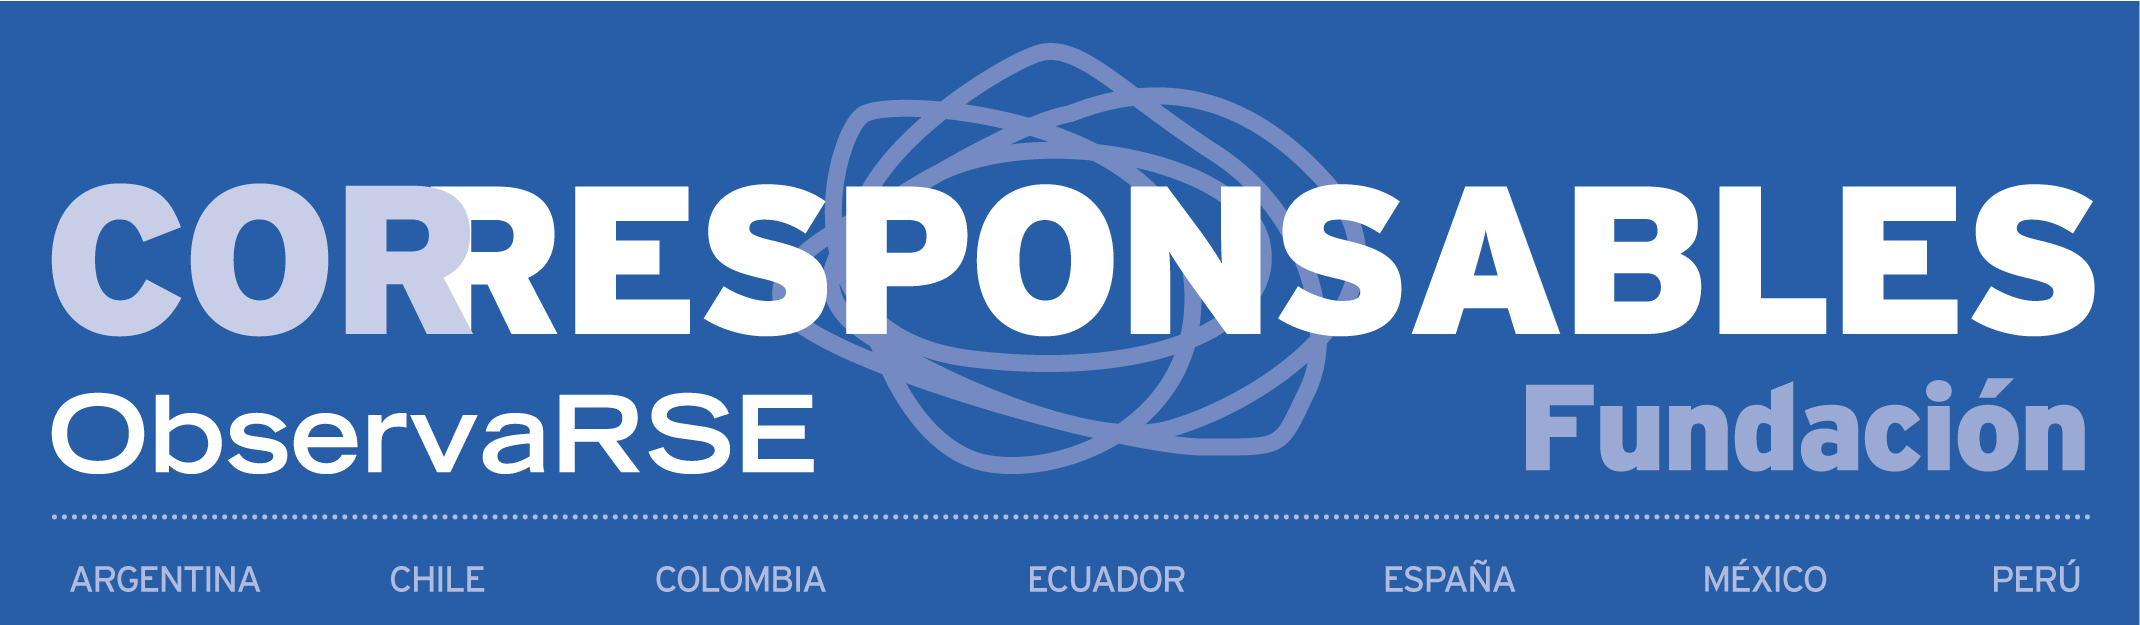 CORRESPONSABLES logo generico